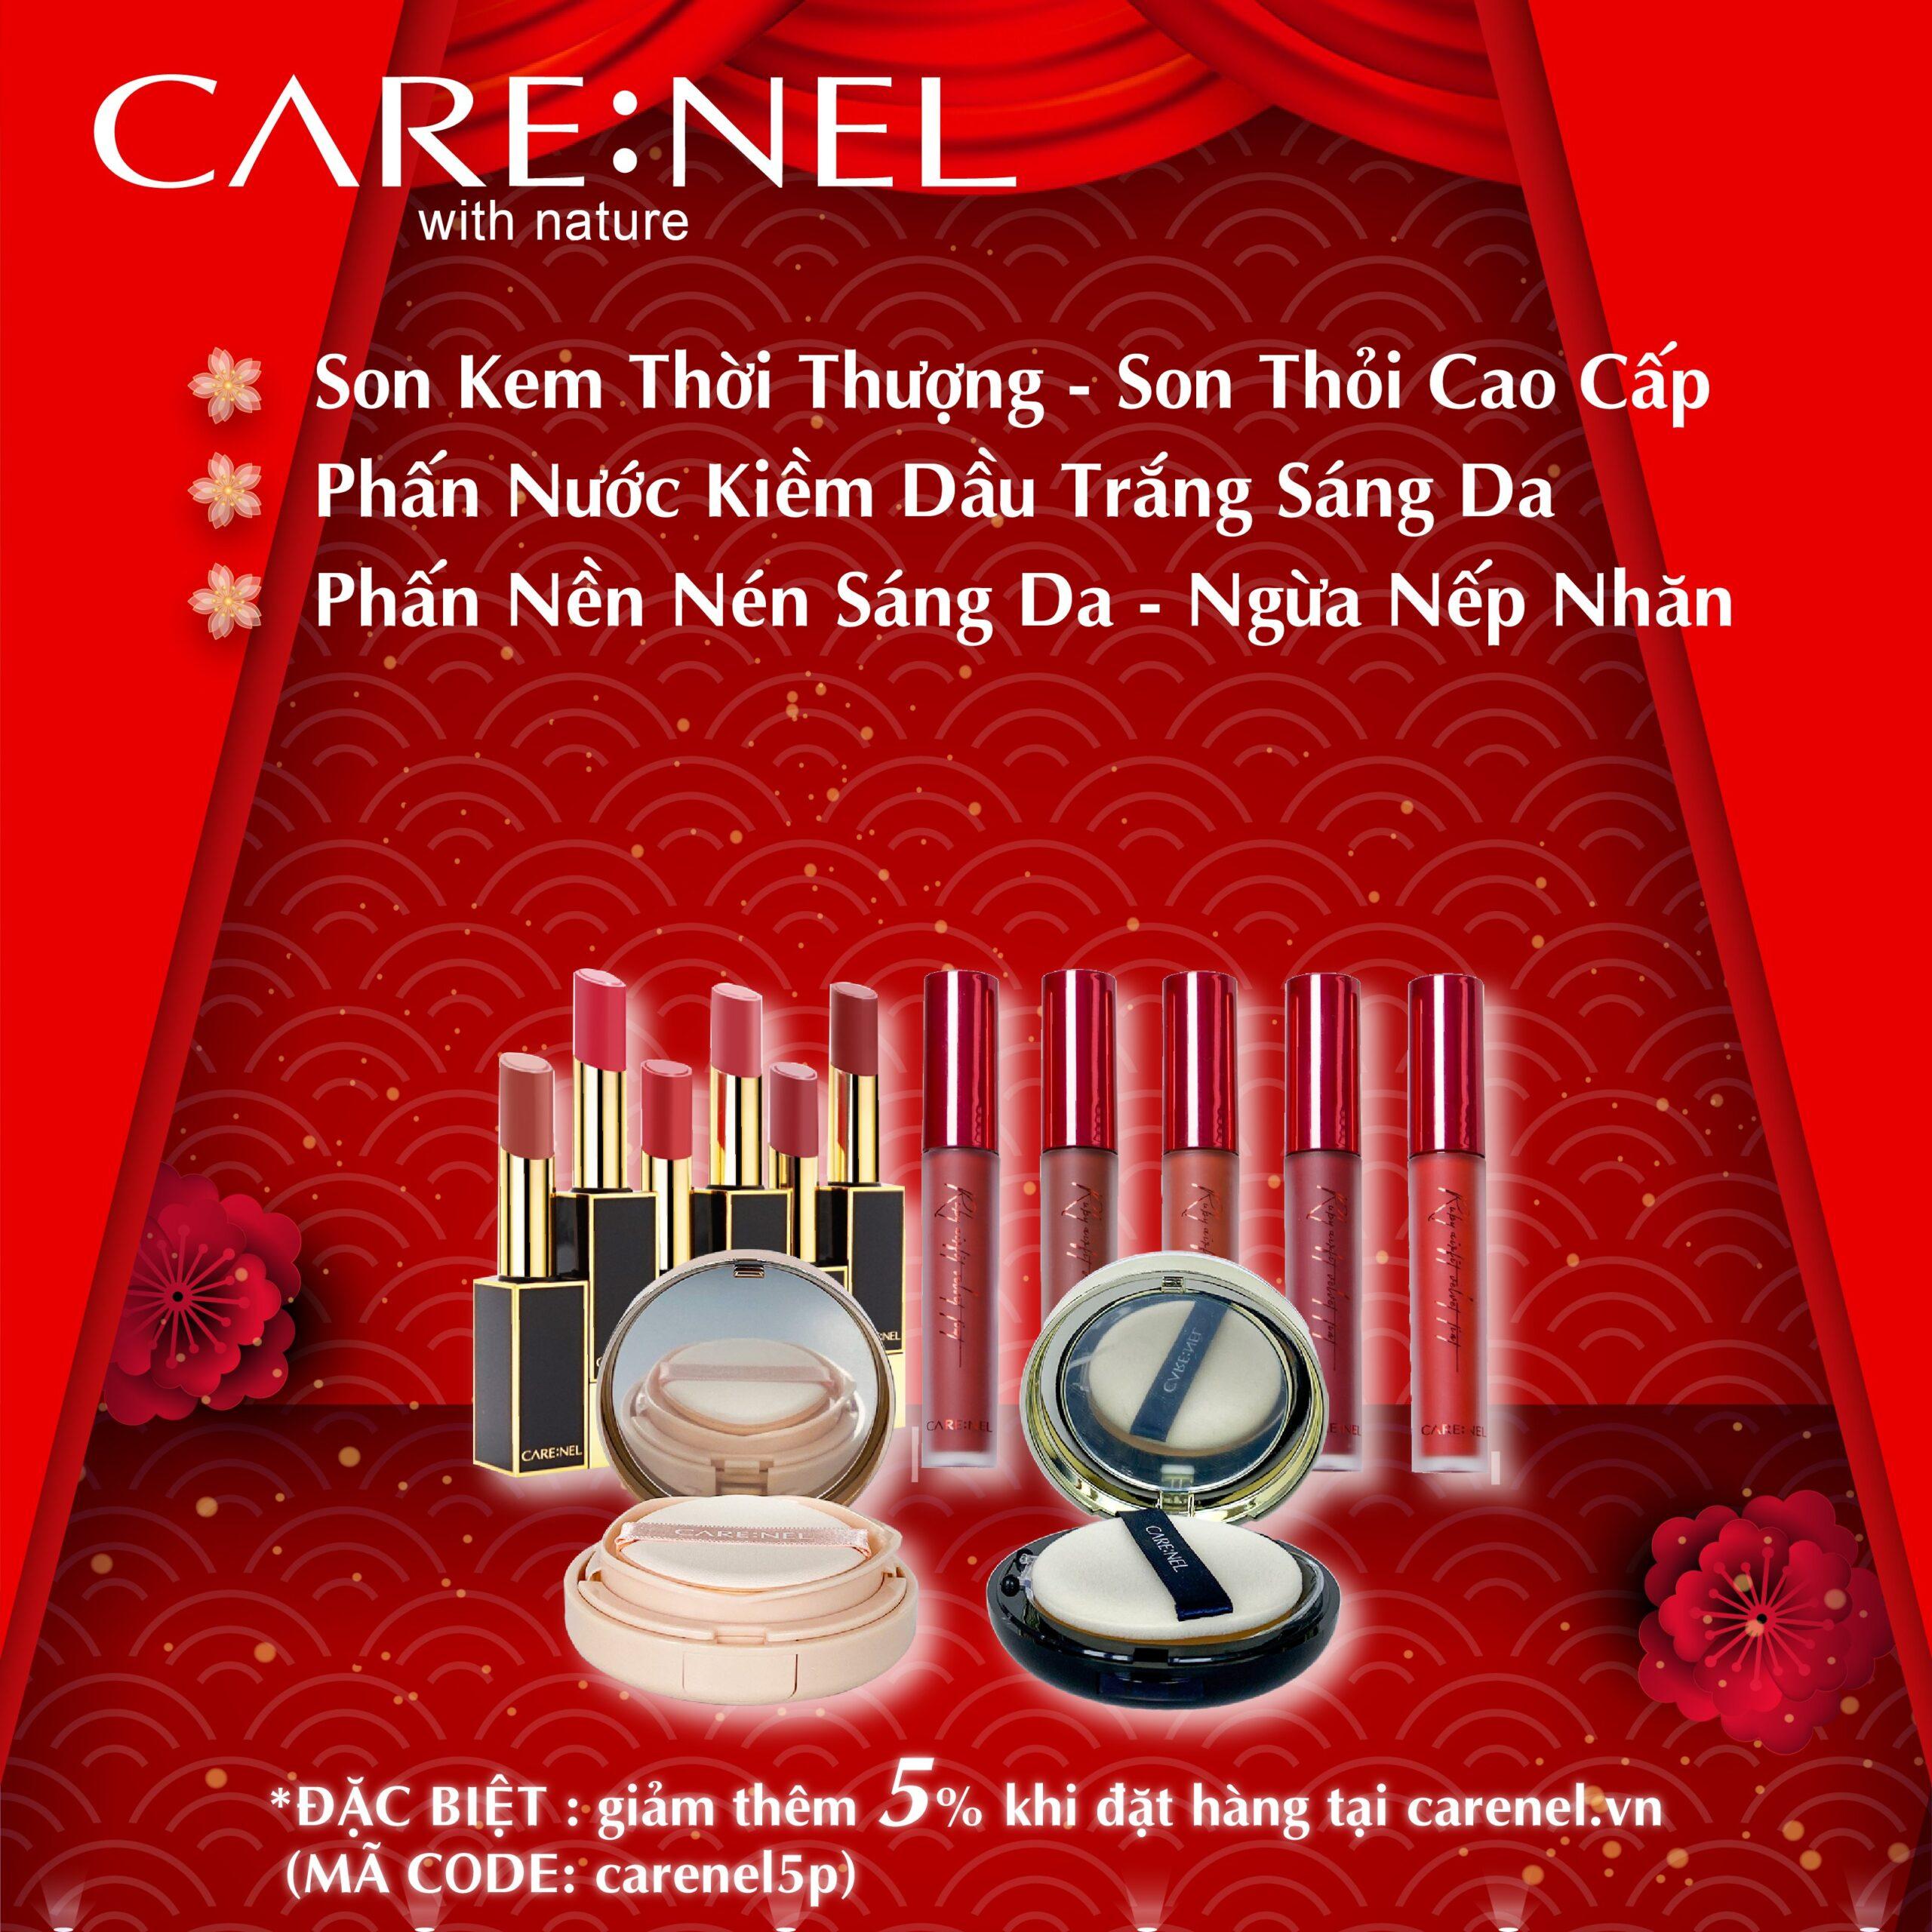 Chuong Trinh Uu Dai Hpny 2021 Carenel 4